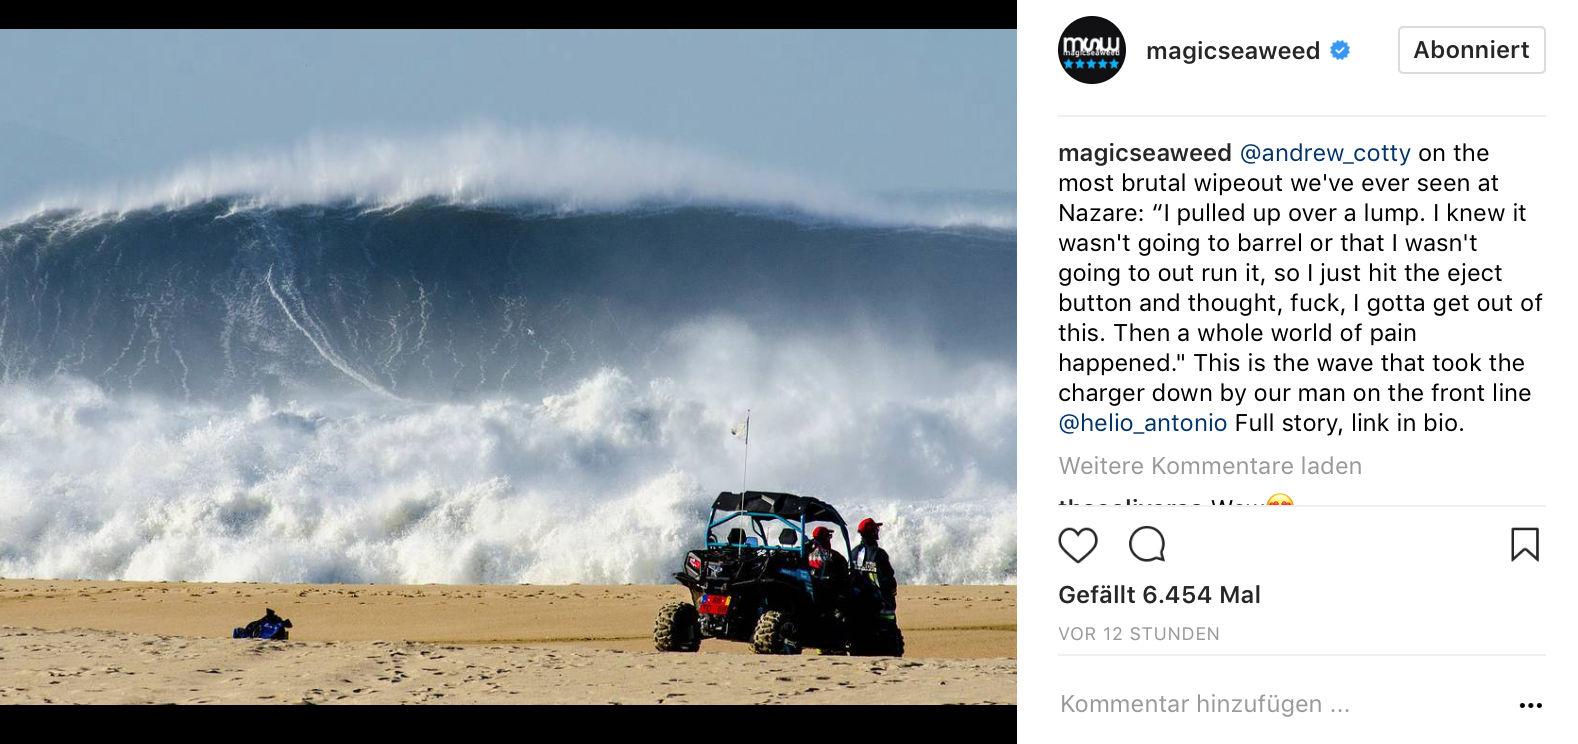 Wie groß ist die Welle? Riesig!